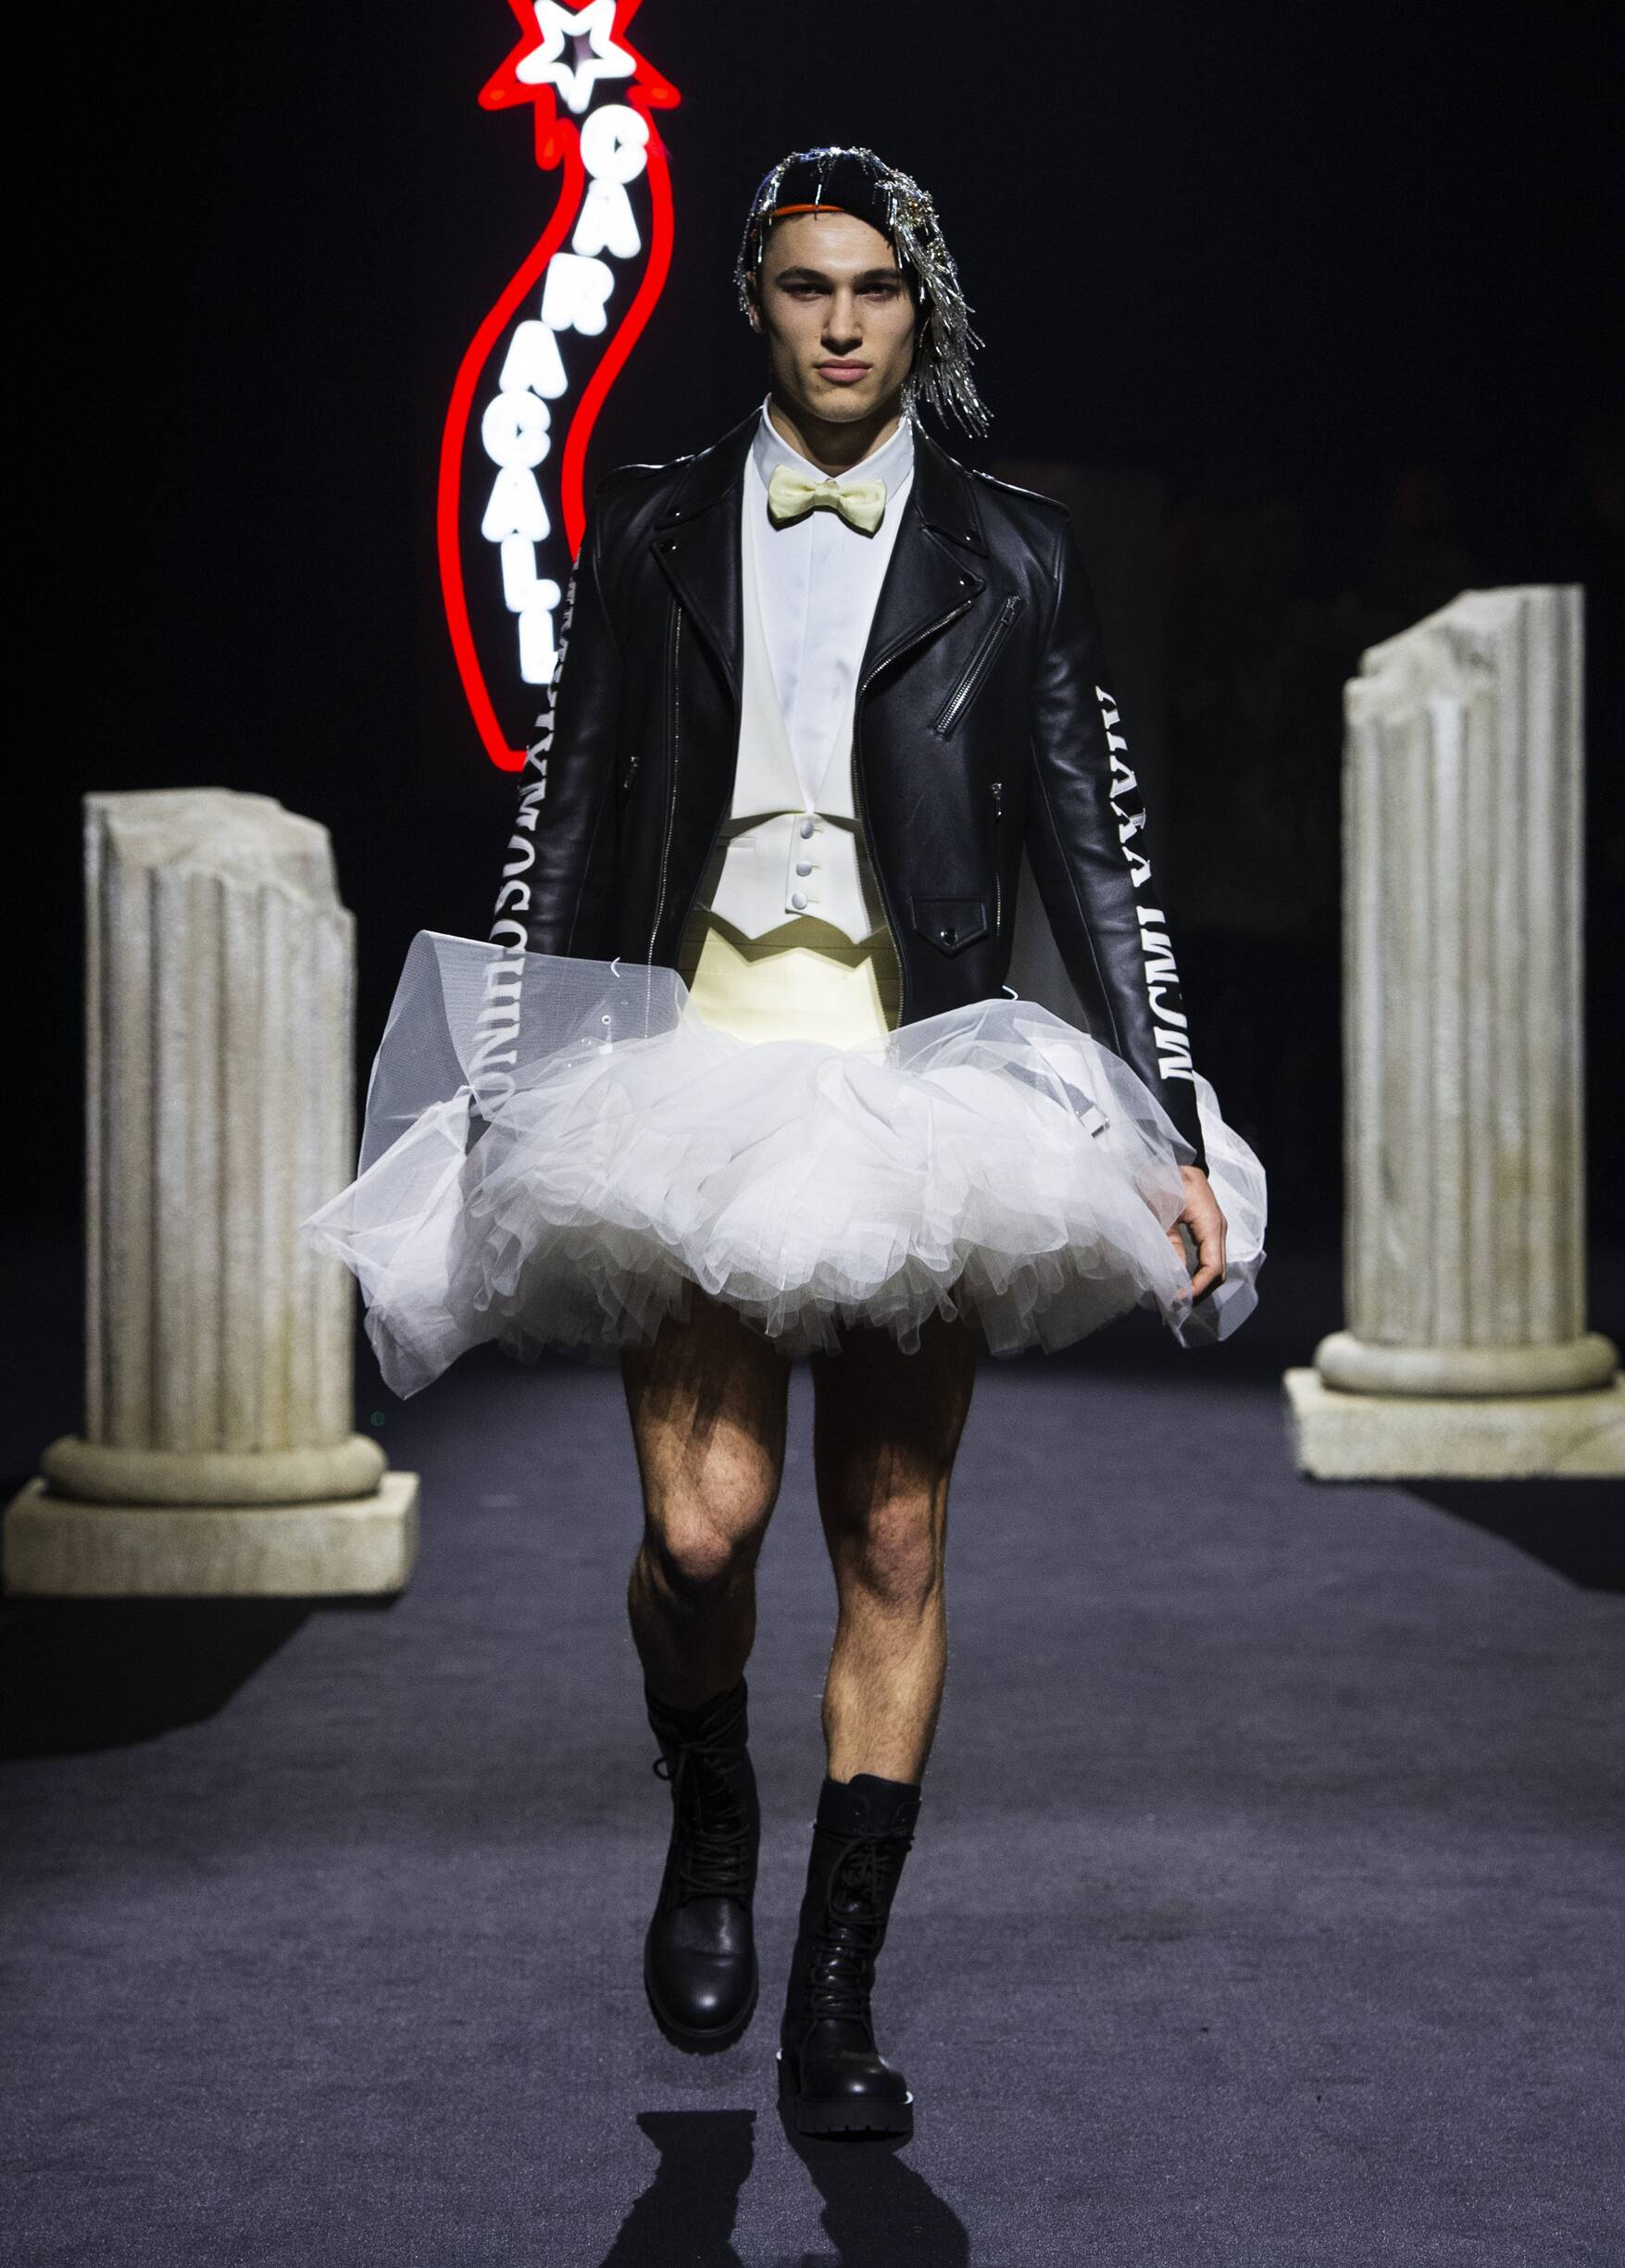 Fall Winter Fashion Trends 2019 Moschino